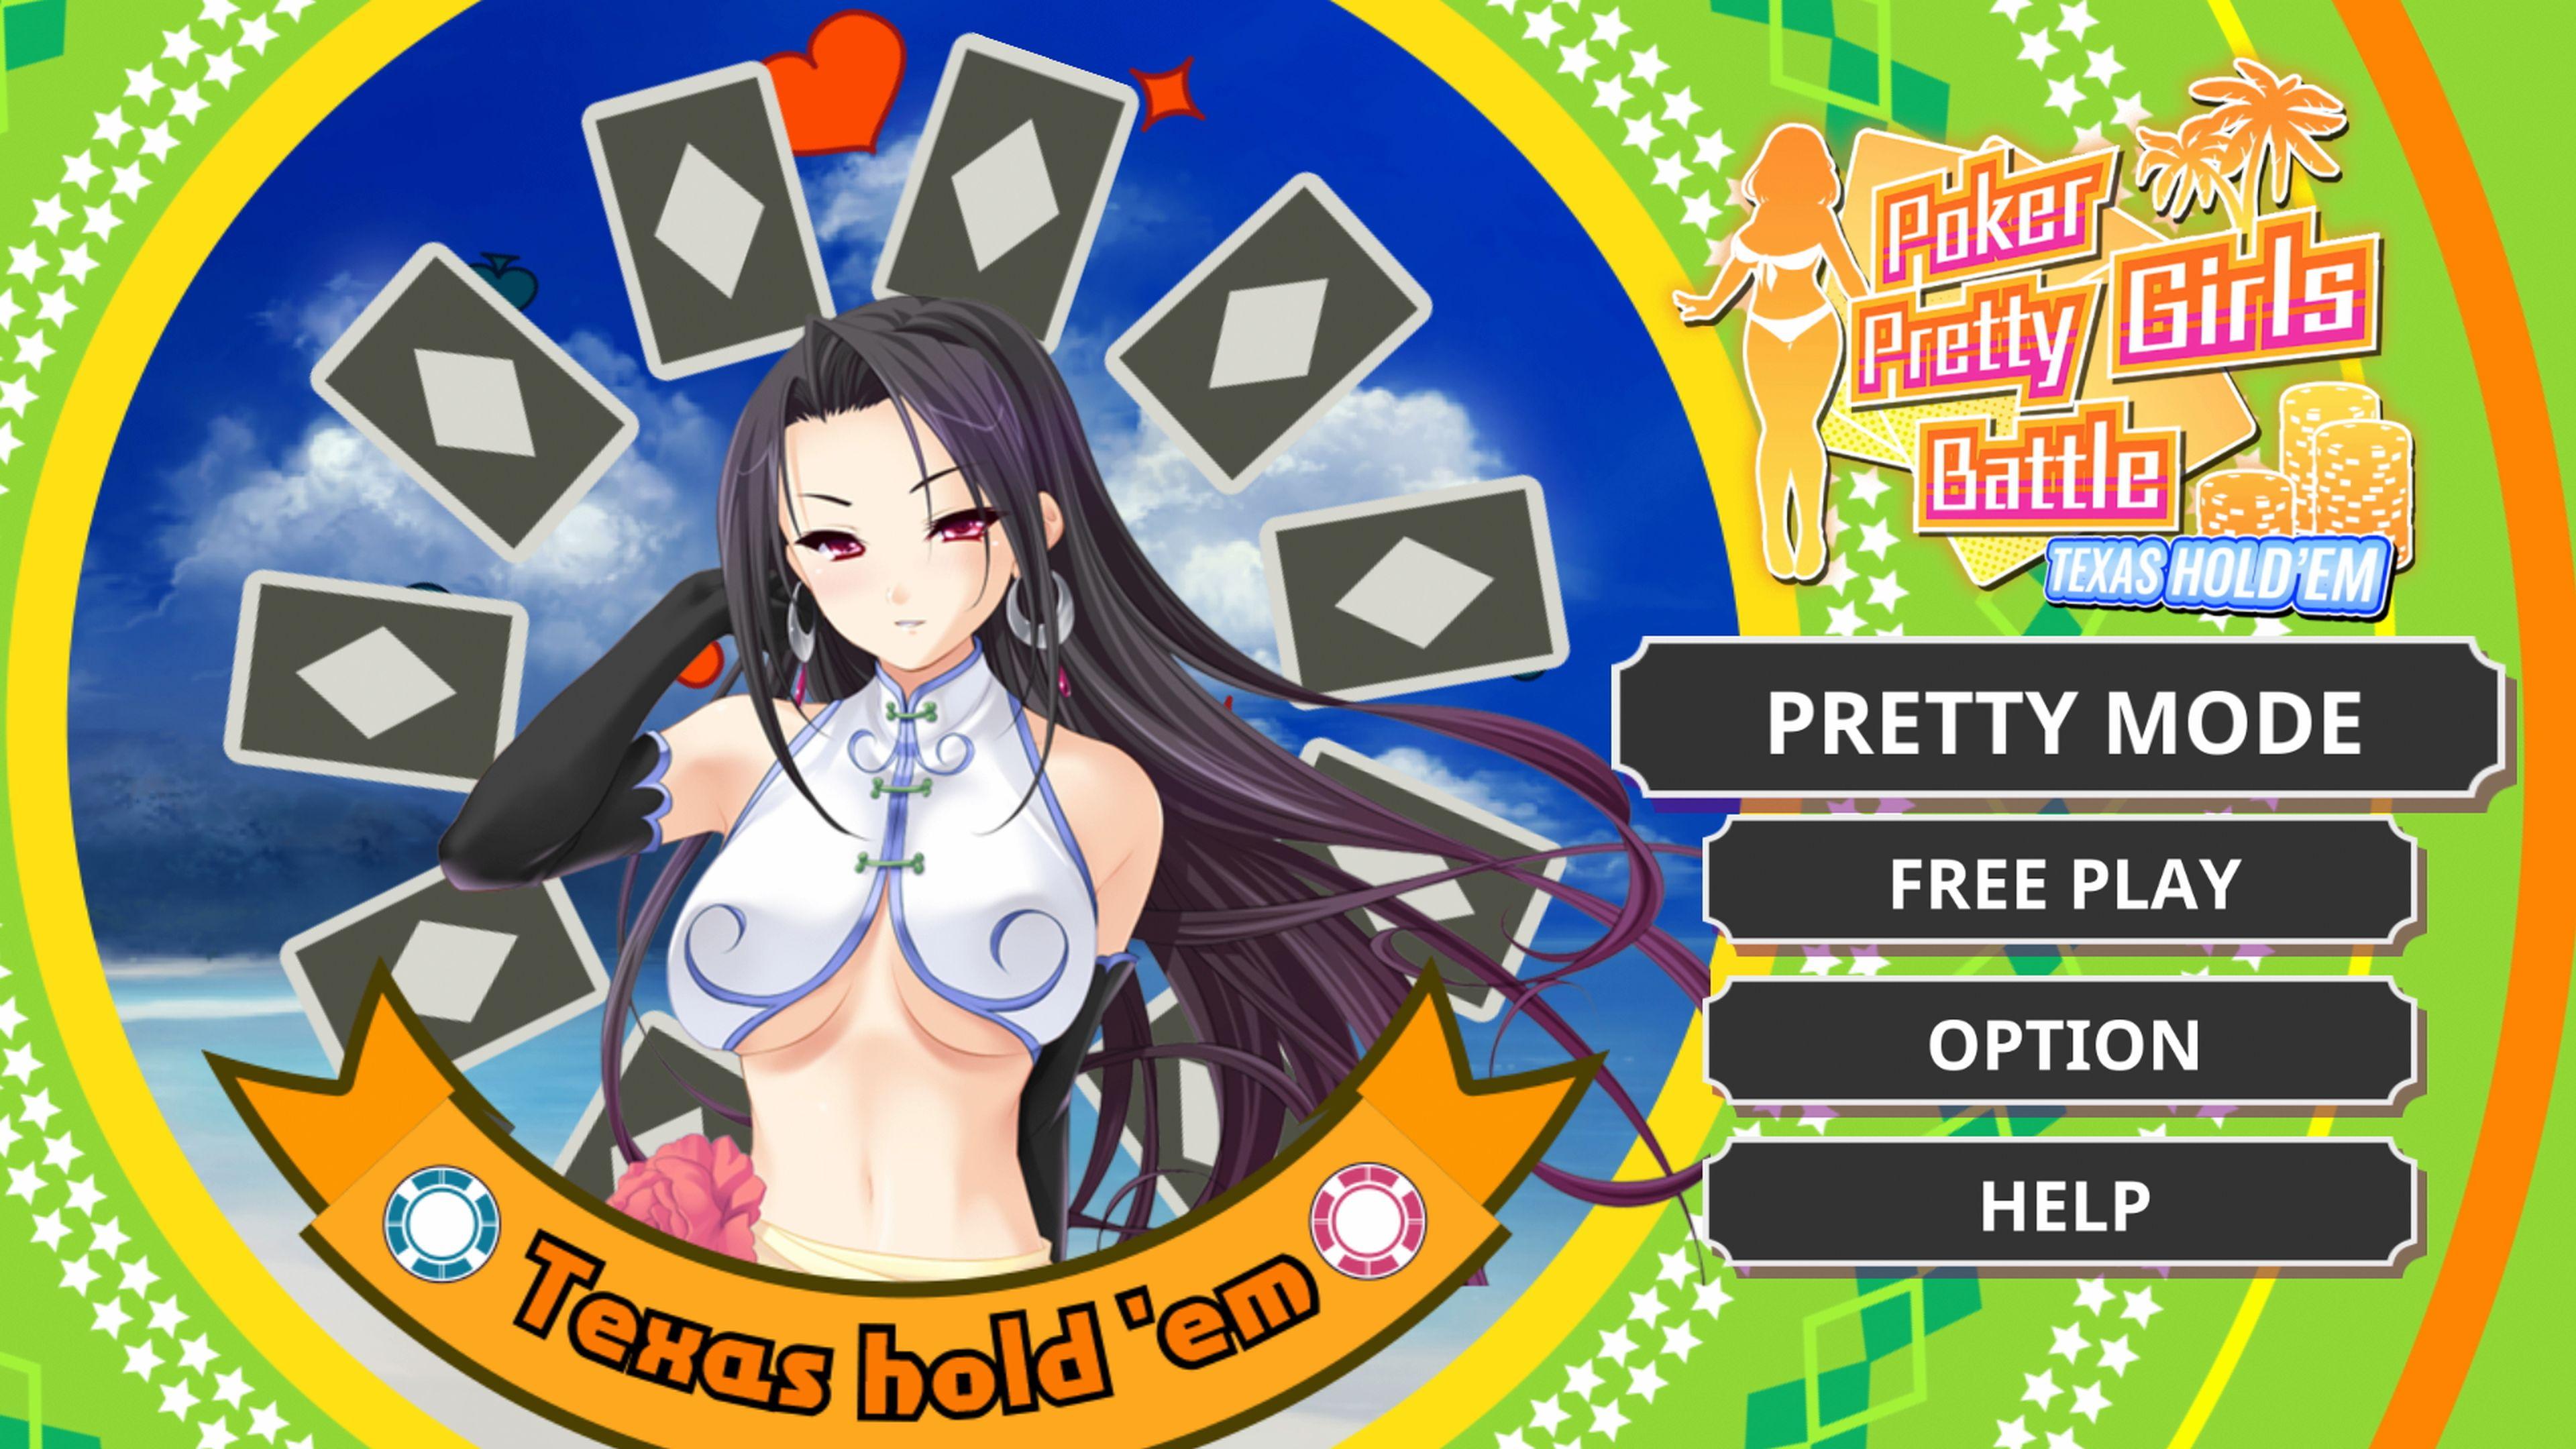 Скриншот №1 к Poker Pretty Girls Battle Texas Holdem PS4 and PS5